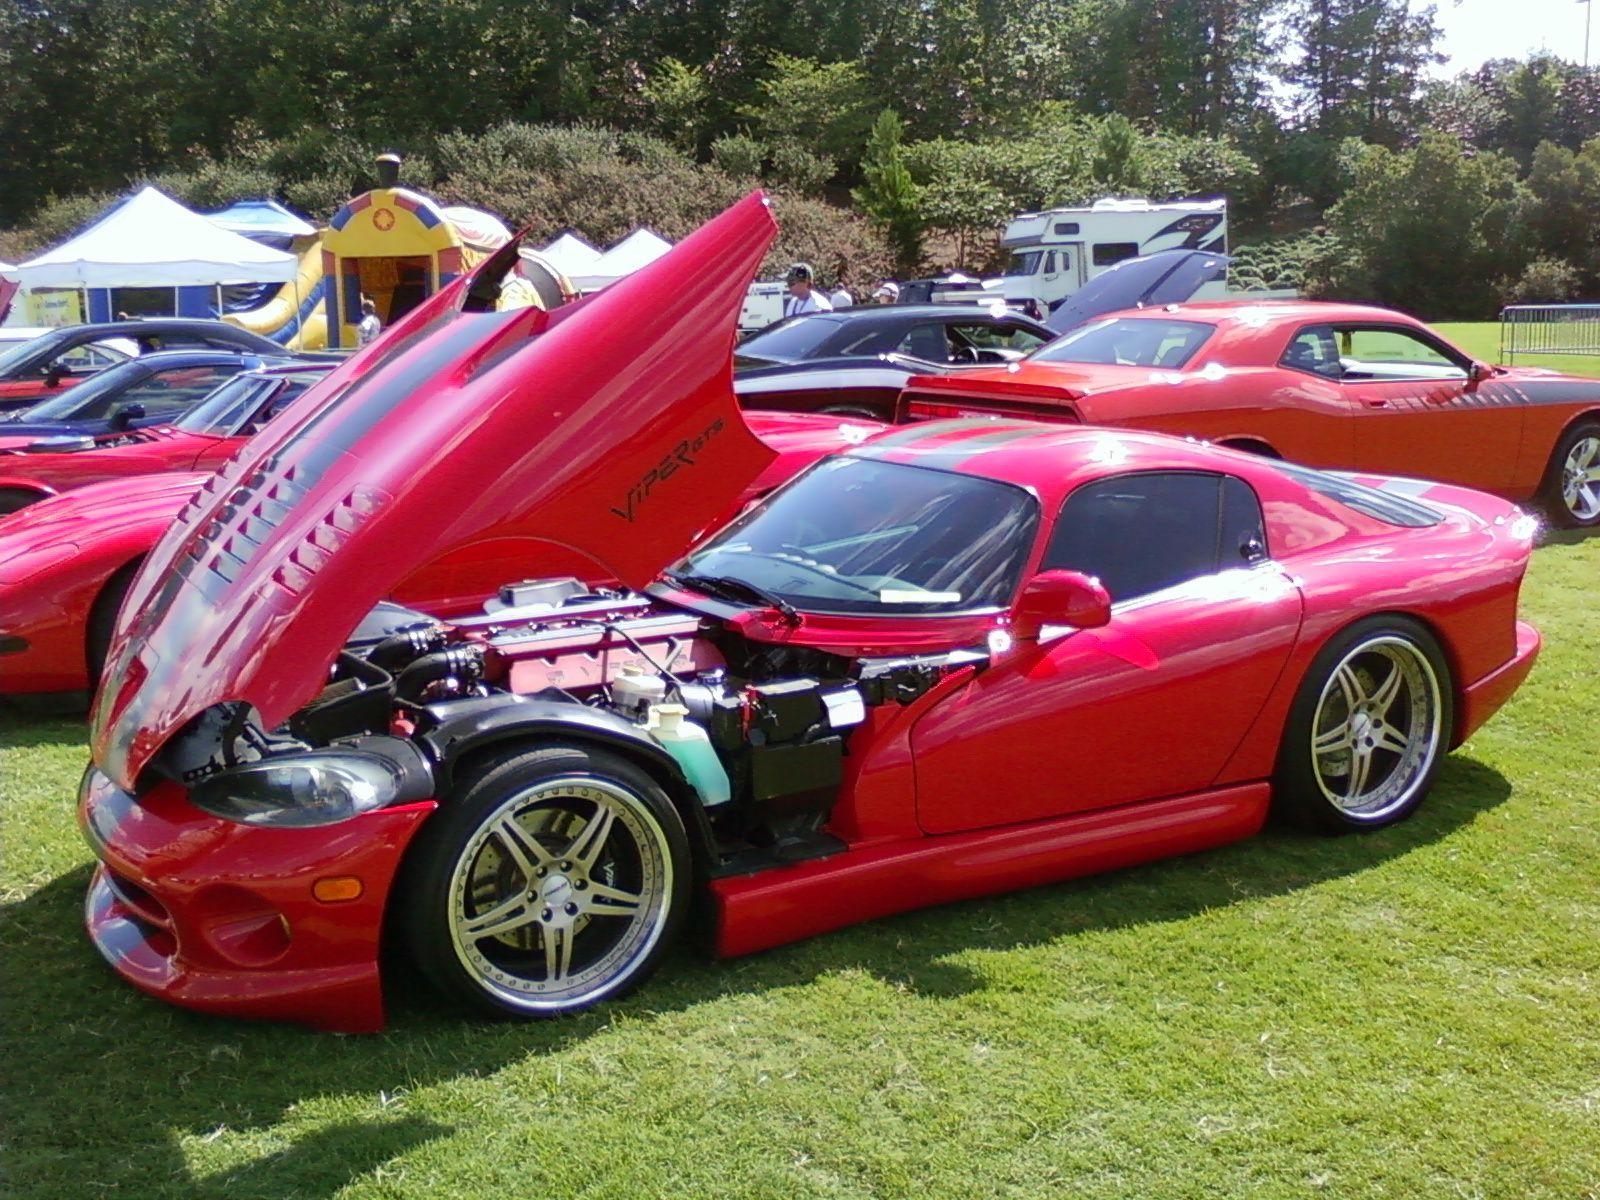 2002 Dodge Viper | Rich Sclichter's Dodge Viper on Forgeline SP3P Wheels